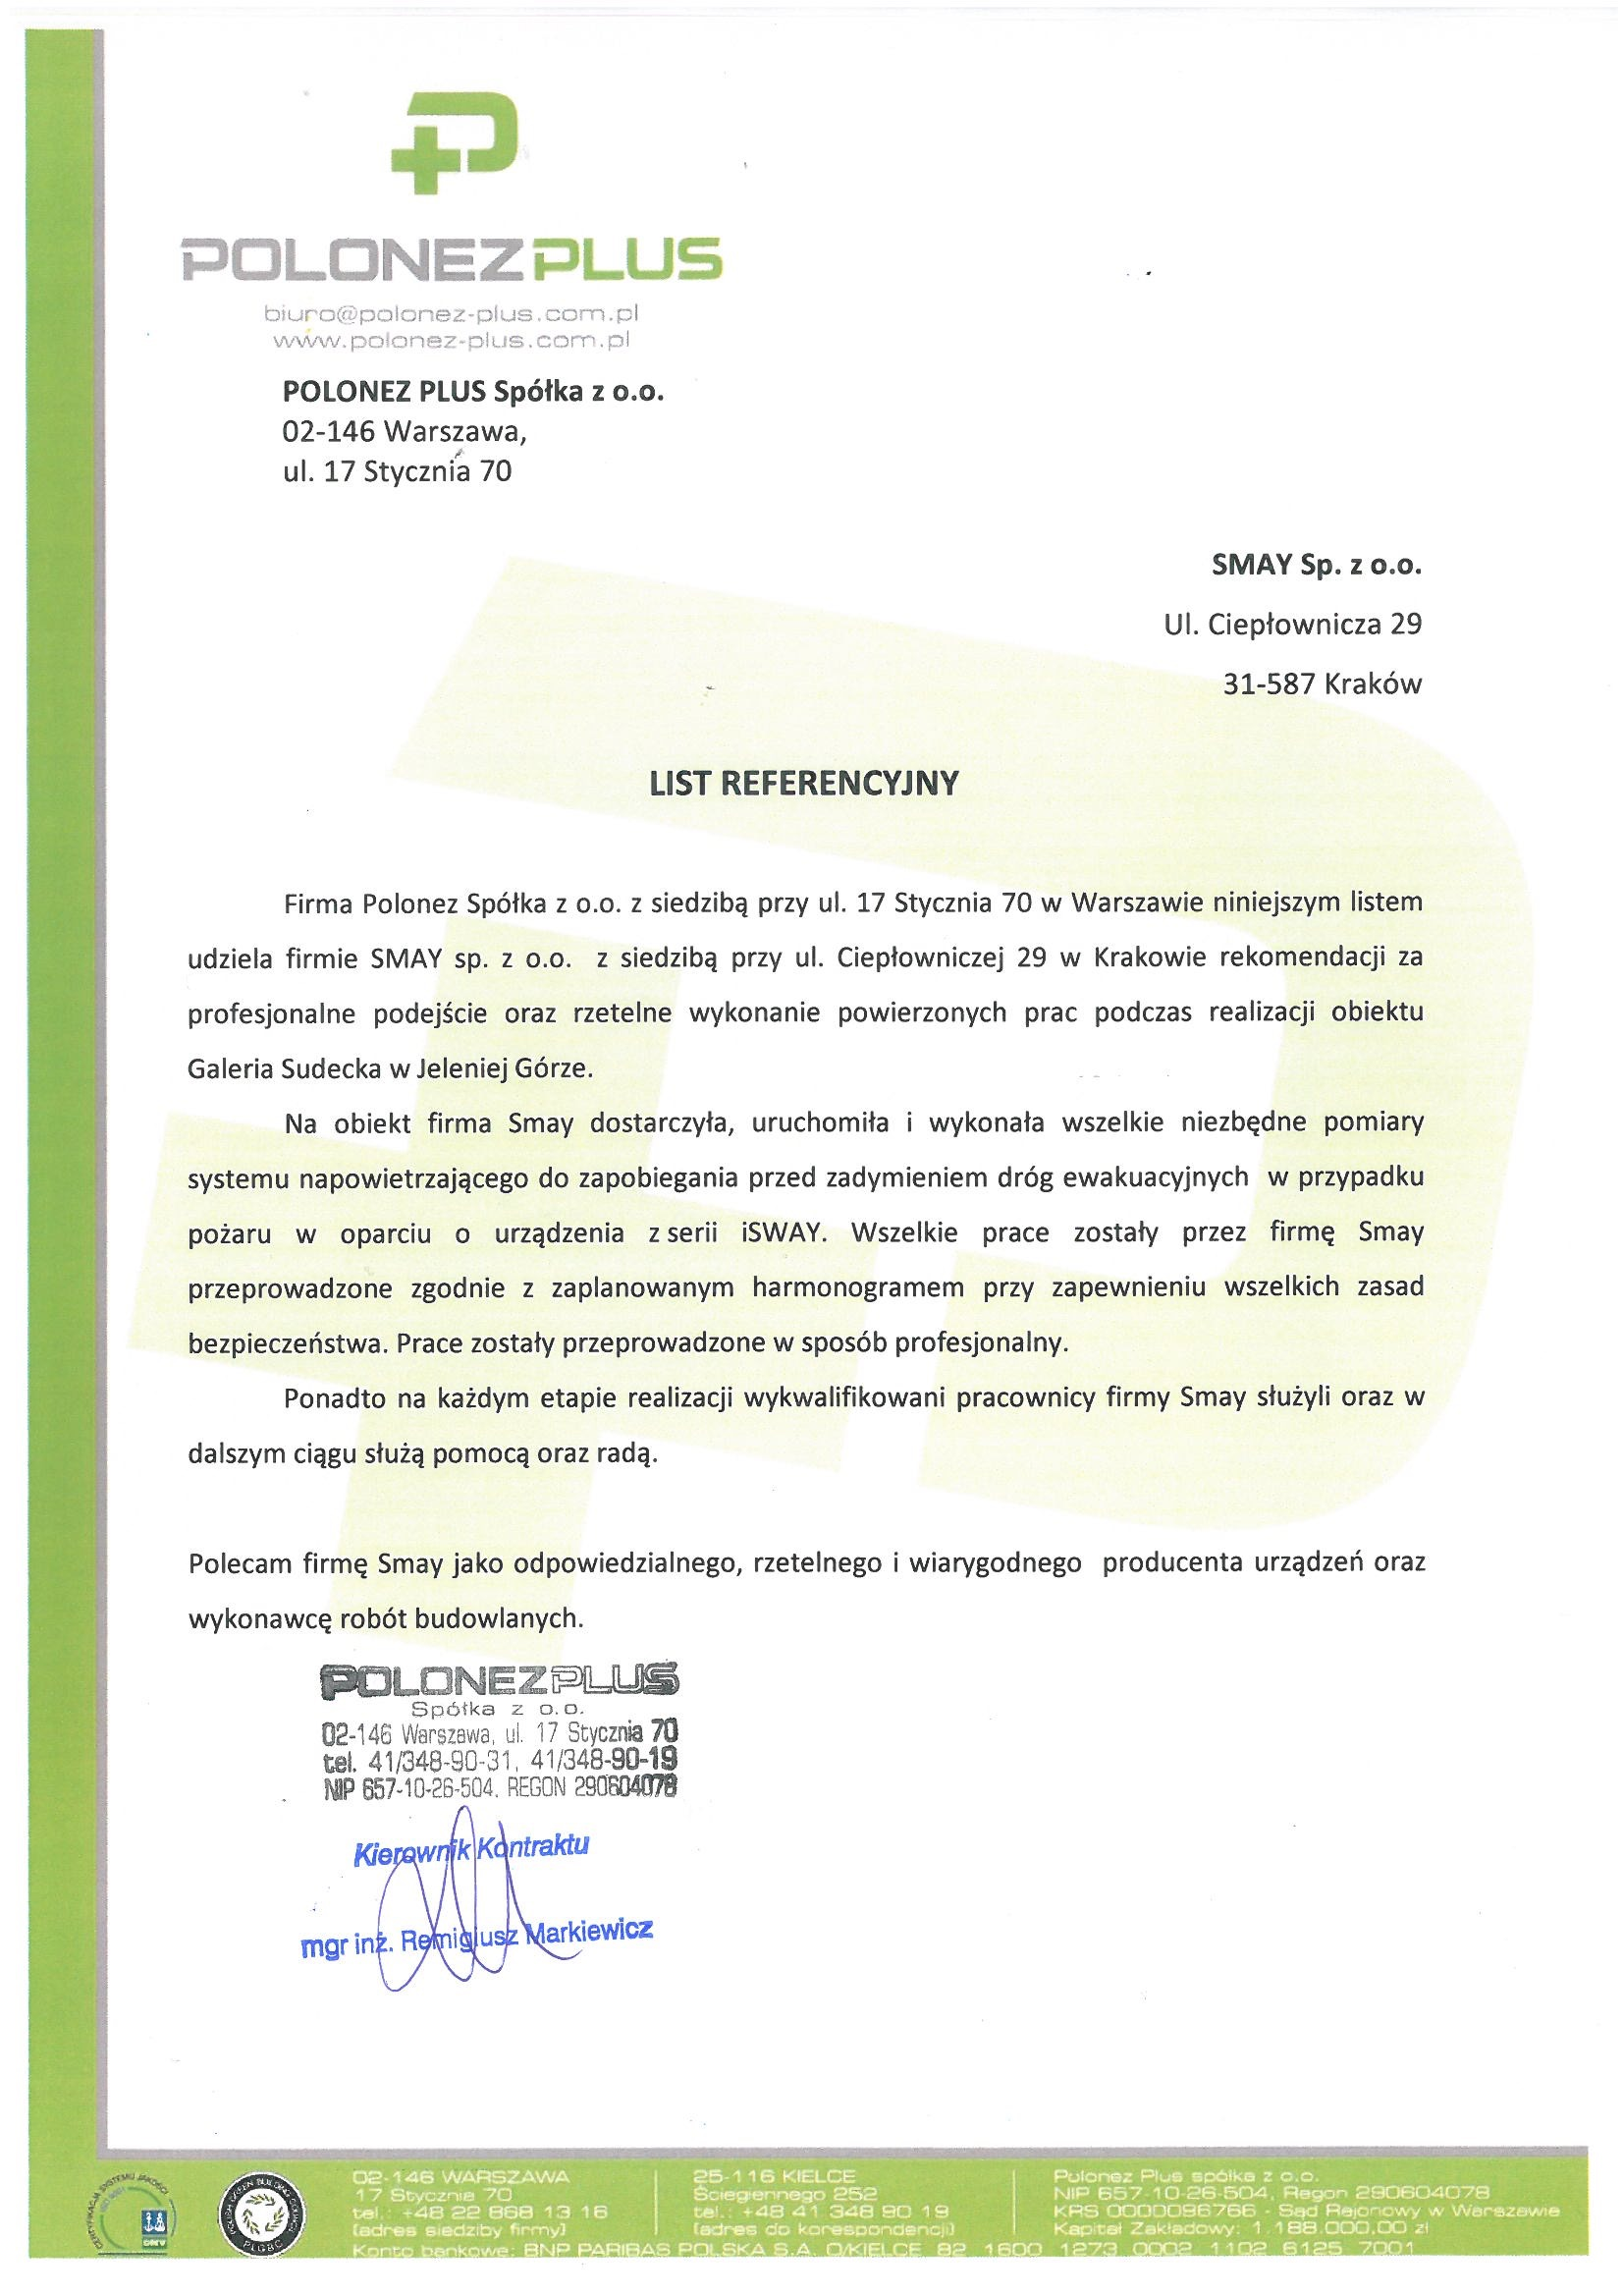 Referencja - POLONES PLUS Sp. z o.o.